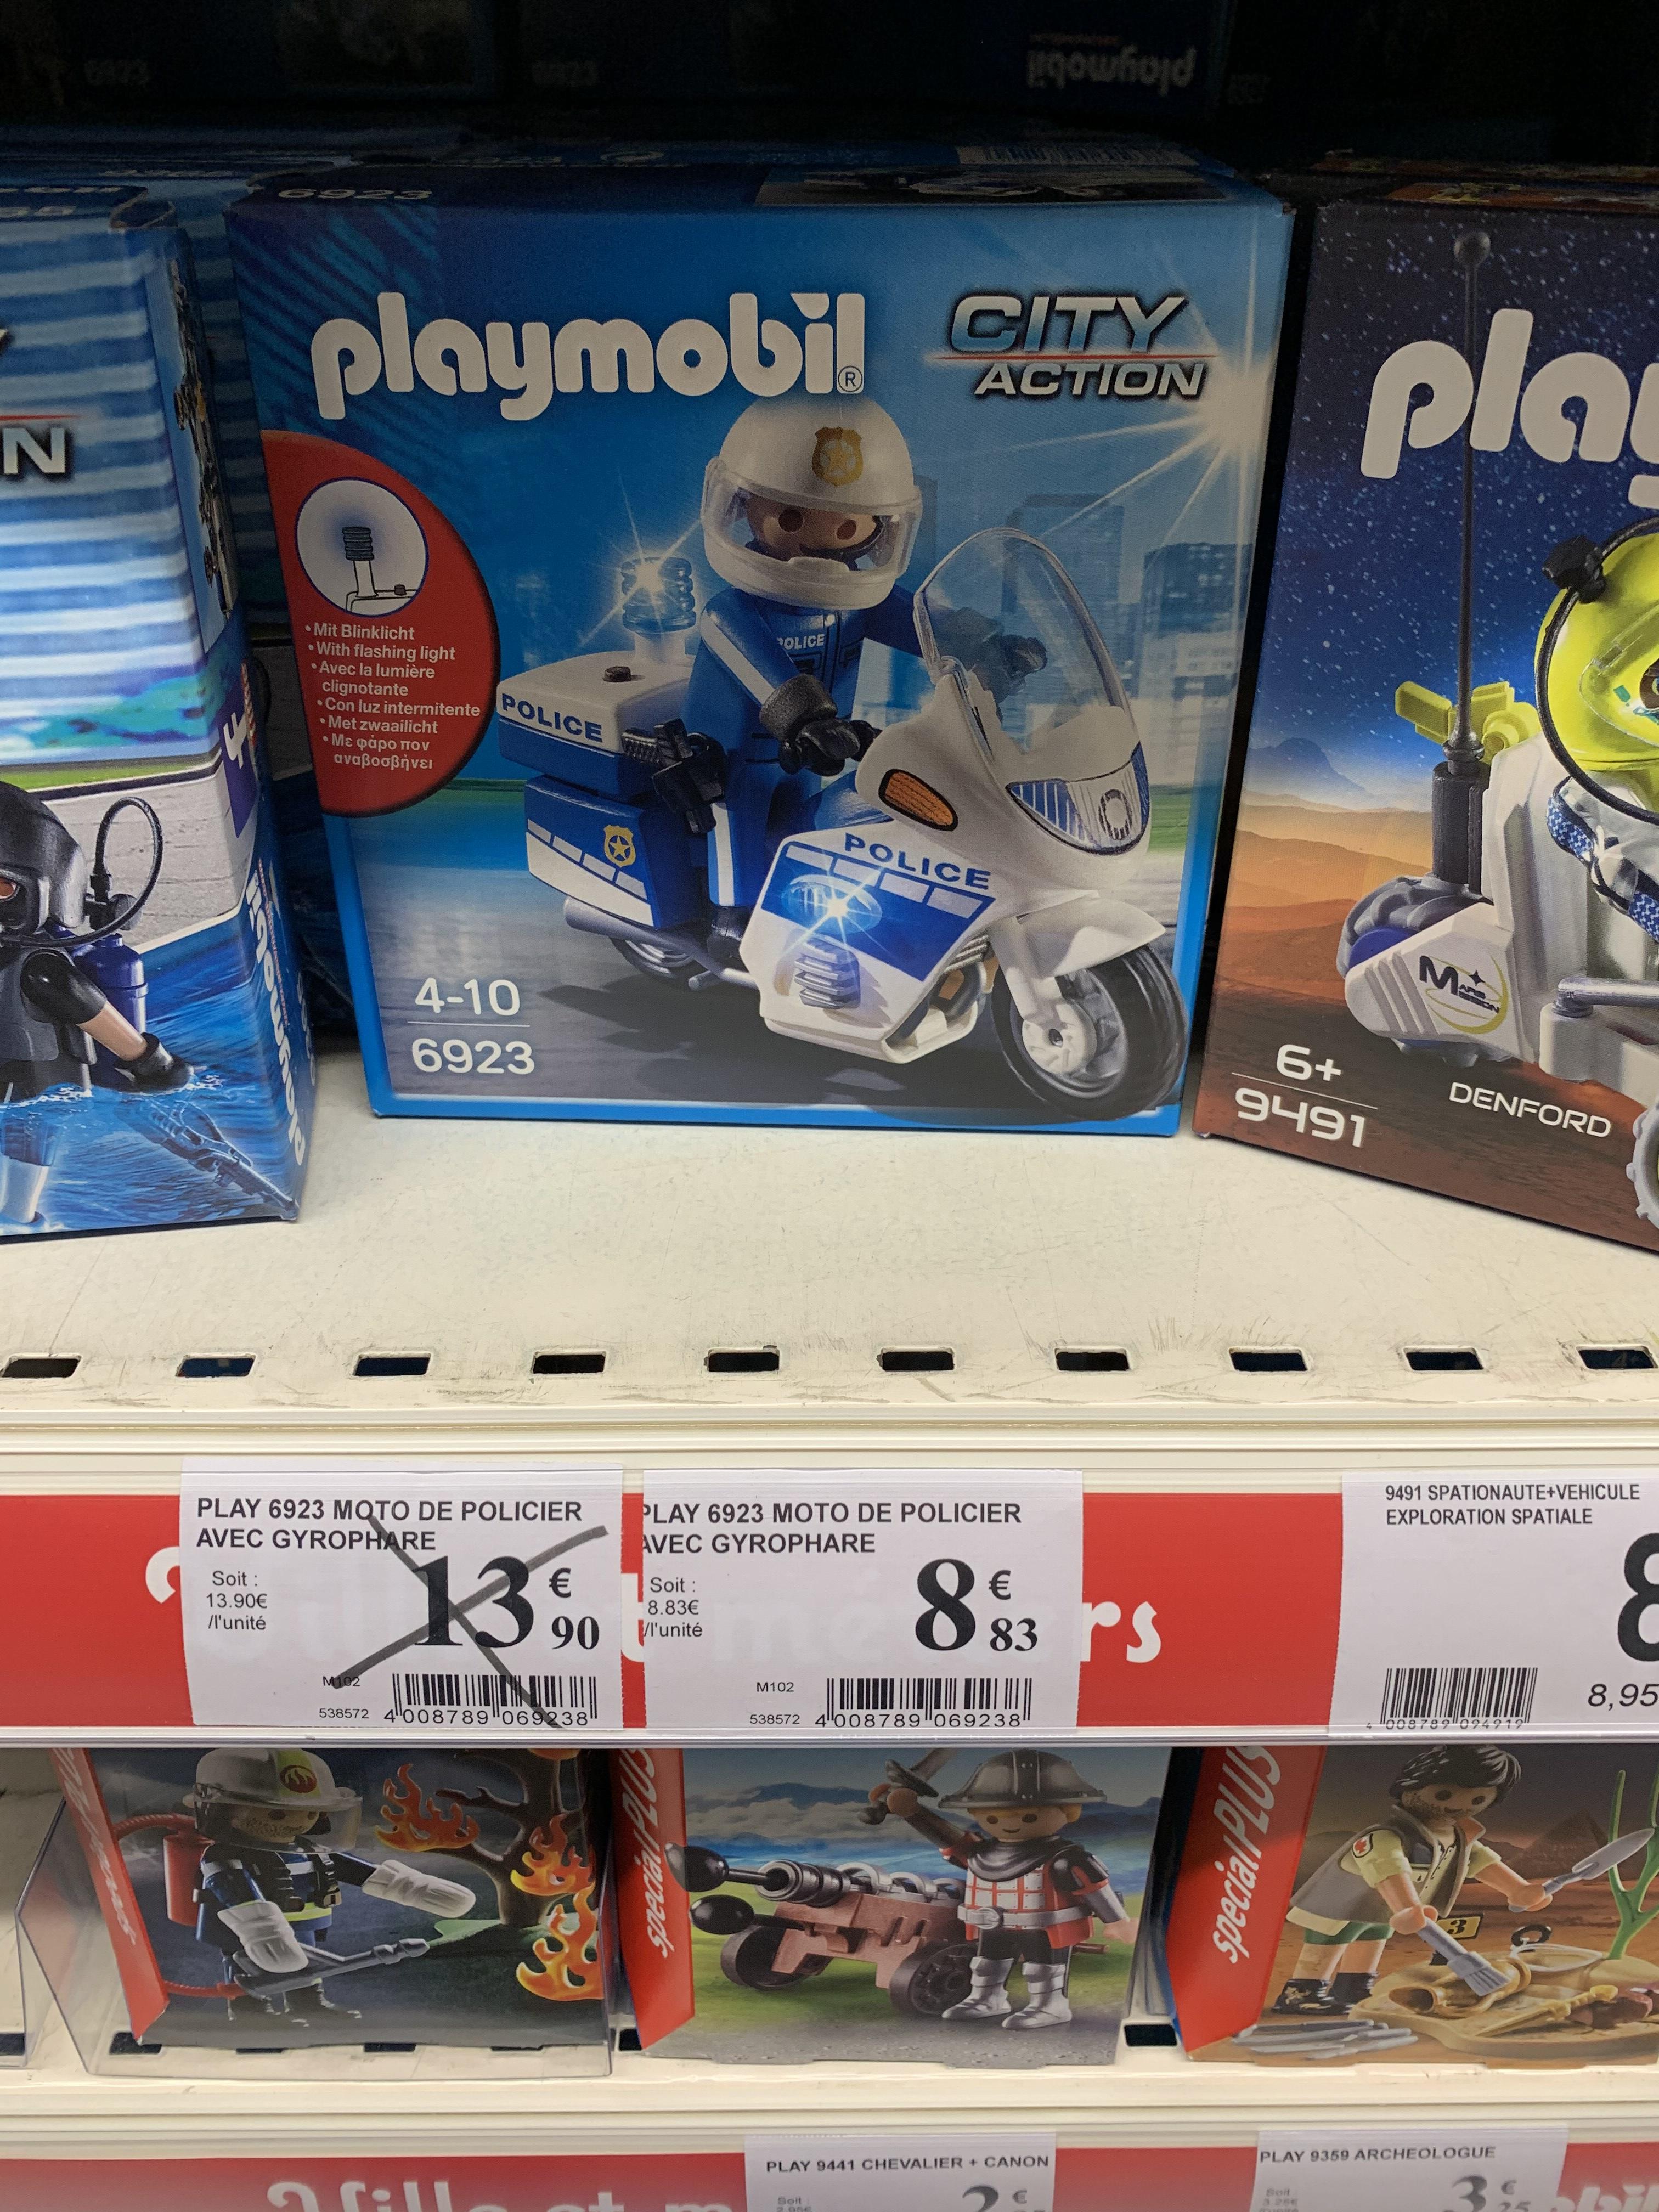 Playmobil 6923 - Moto Police avec Gyrophare - Centre Commercial Meriadeck Bordeaux (33)